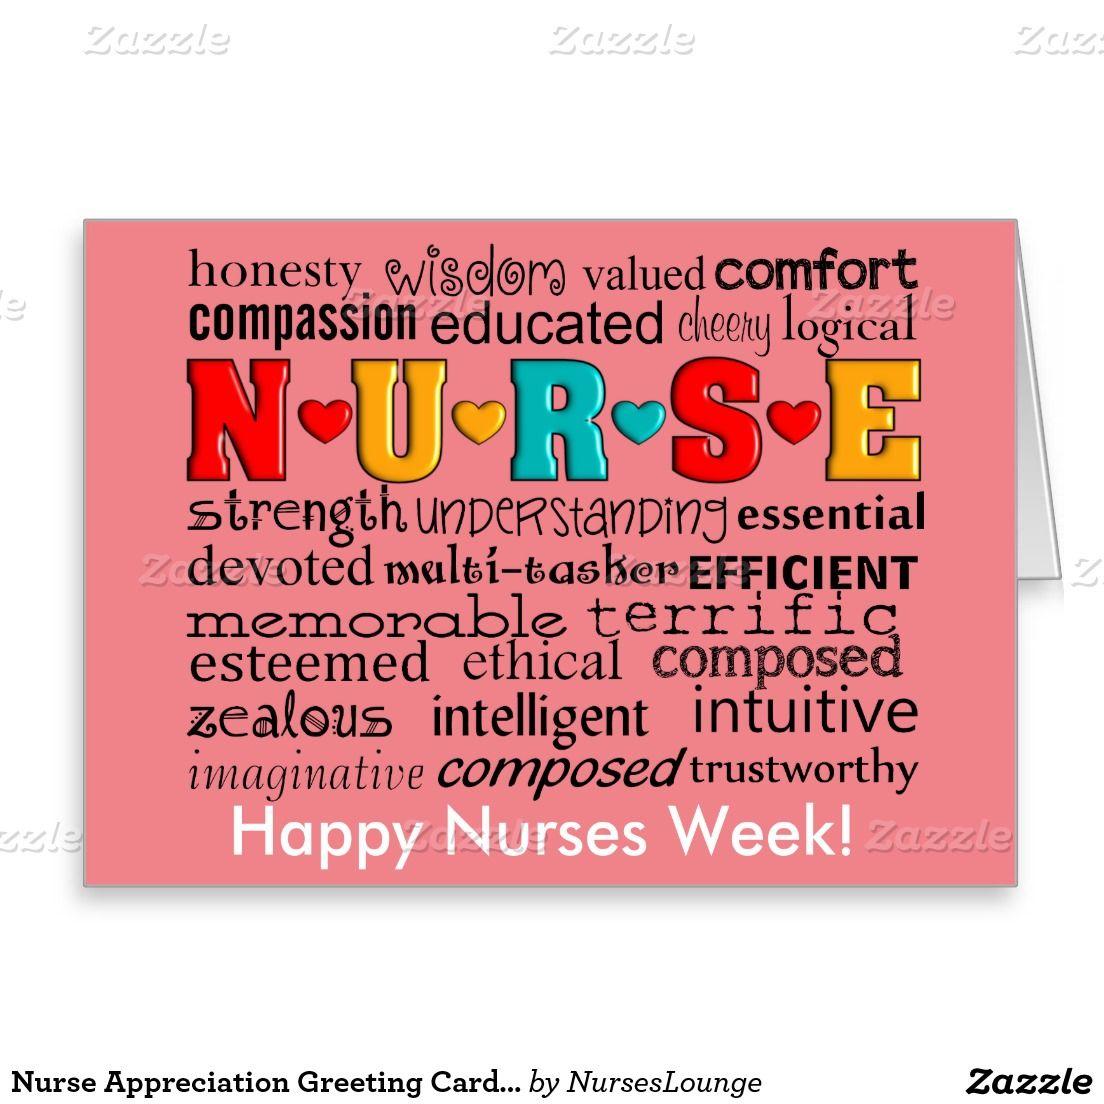 Nurse appreciation greeting card salmon appreciation nurses week nurse appreciation greeting card salmon m4hsunfo Image collections